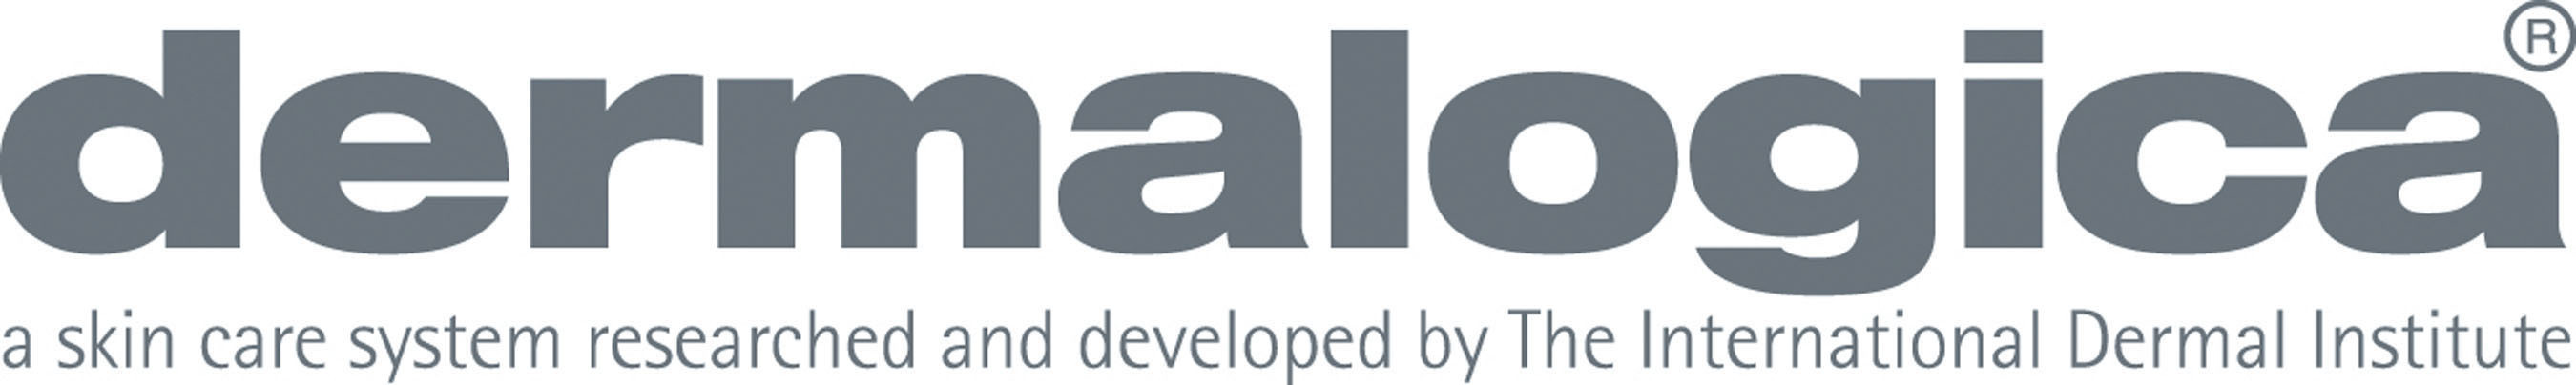 Dermalogica Announces Partnership With NewBeauty TestTube